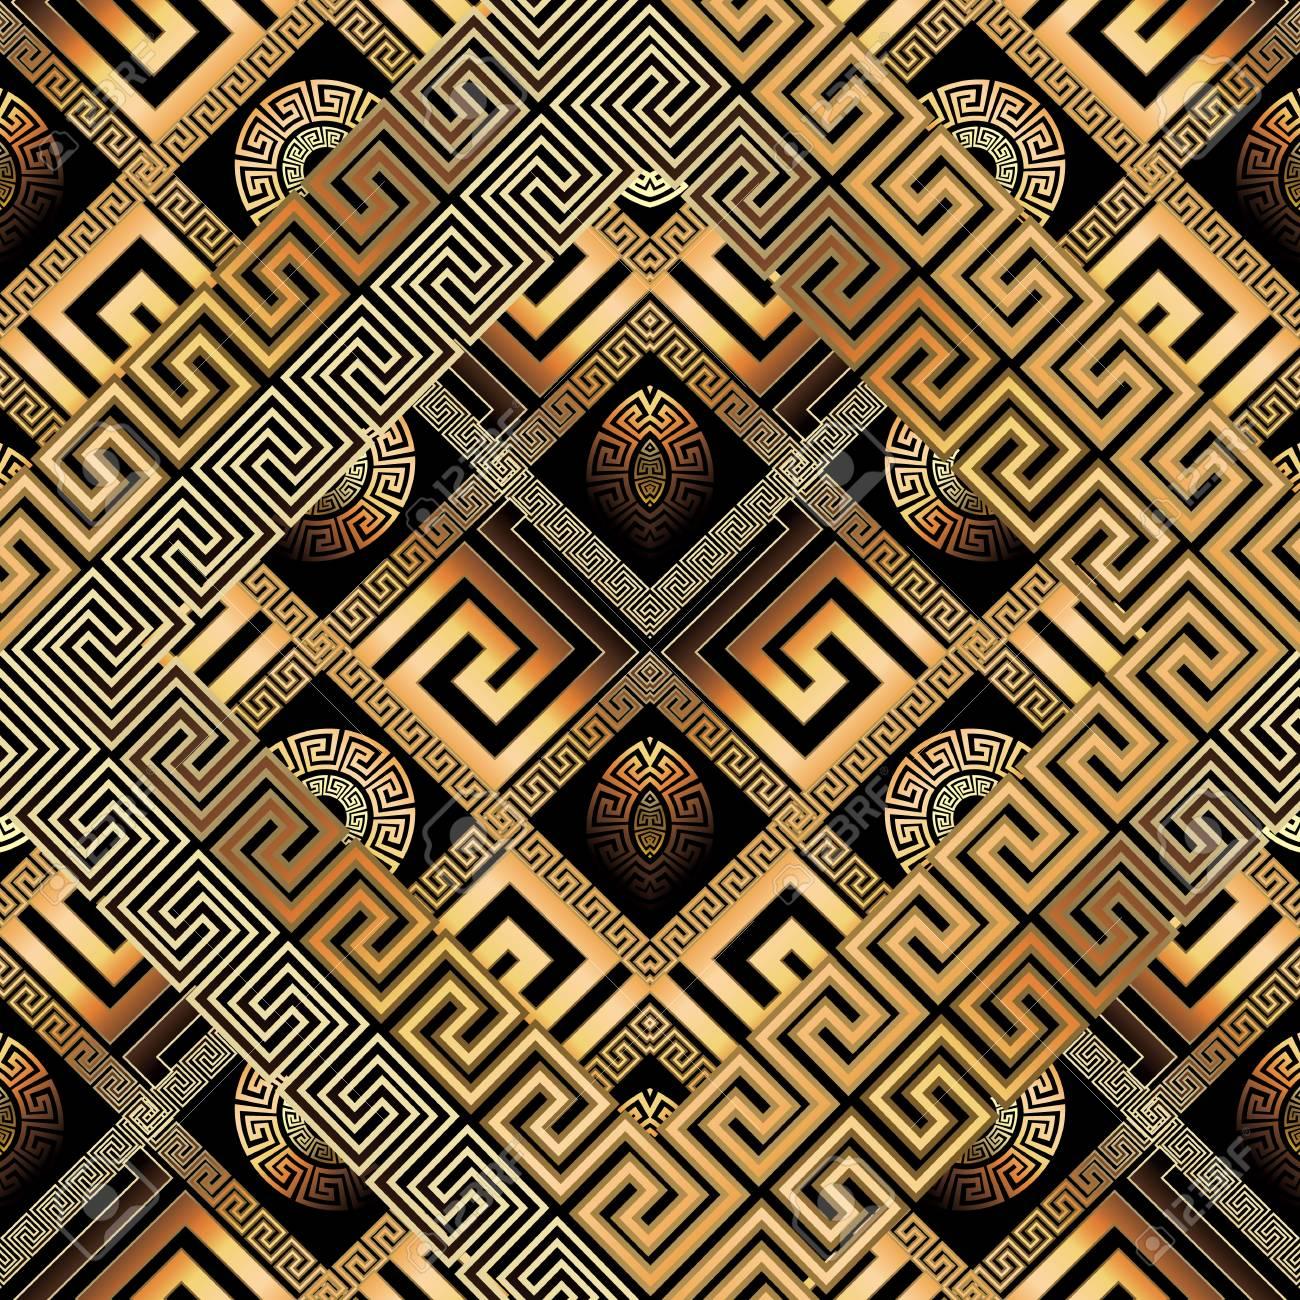 Modern Meander Seamless Pattern Abstract Black Gold Greek Key Background 3d Wallpaper Geometric